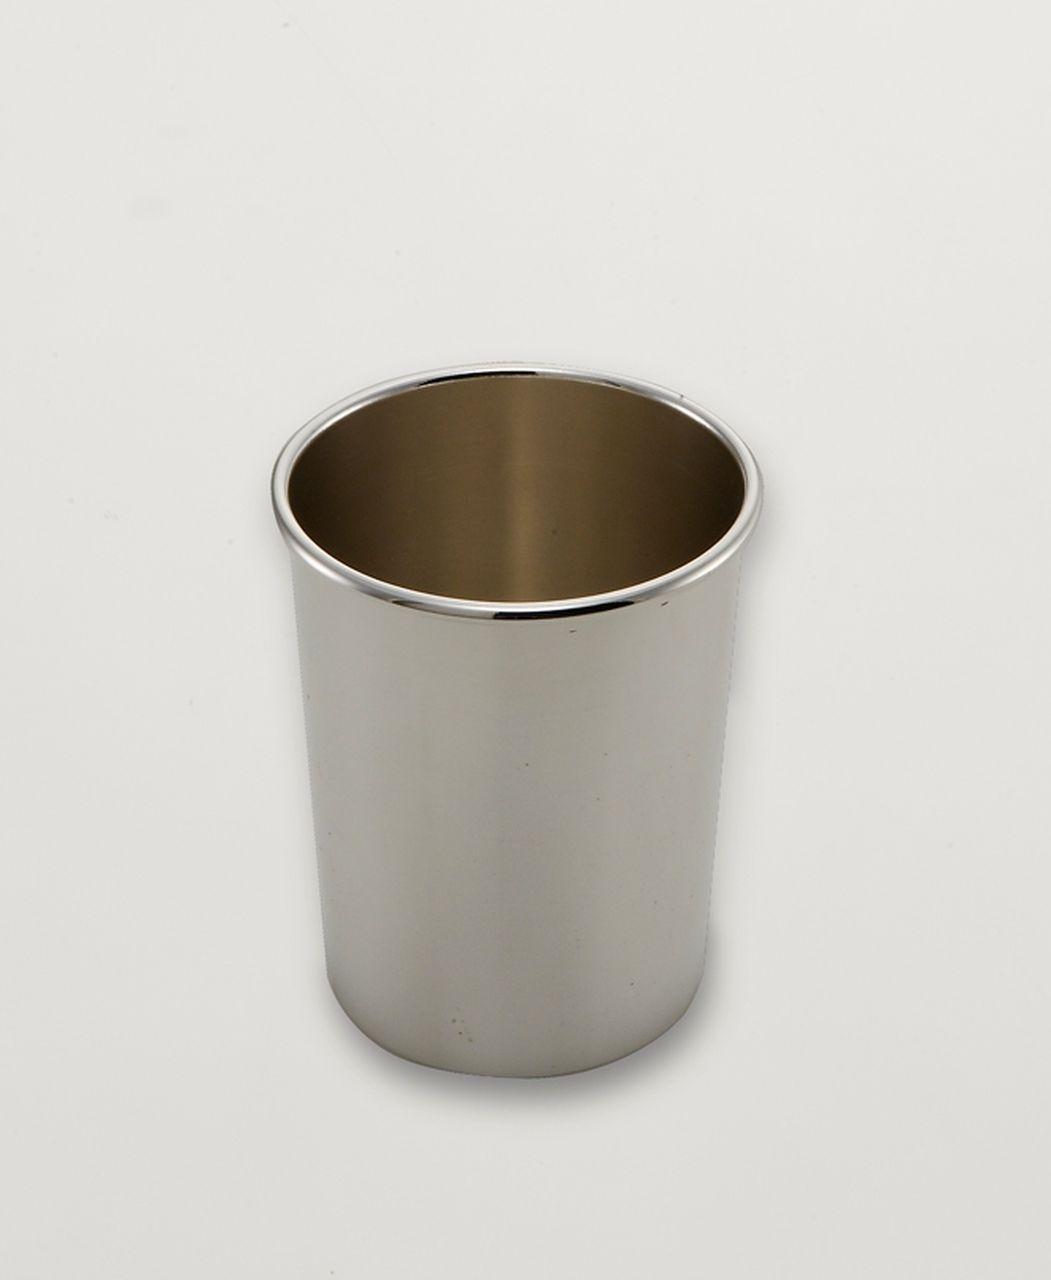 Bicchierino classic argentato argento sheffield cm.10h diam.8,5